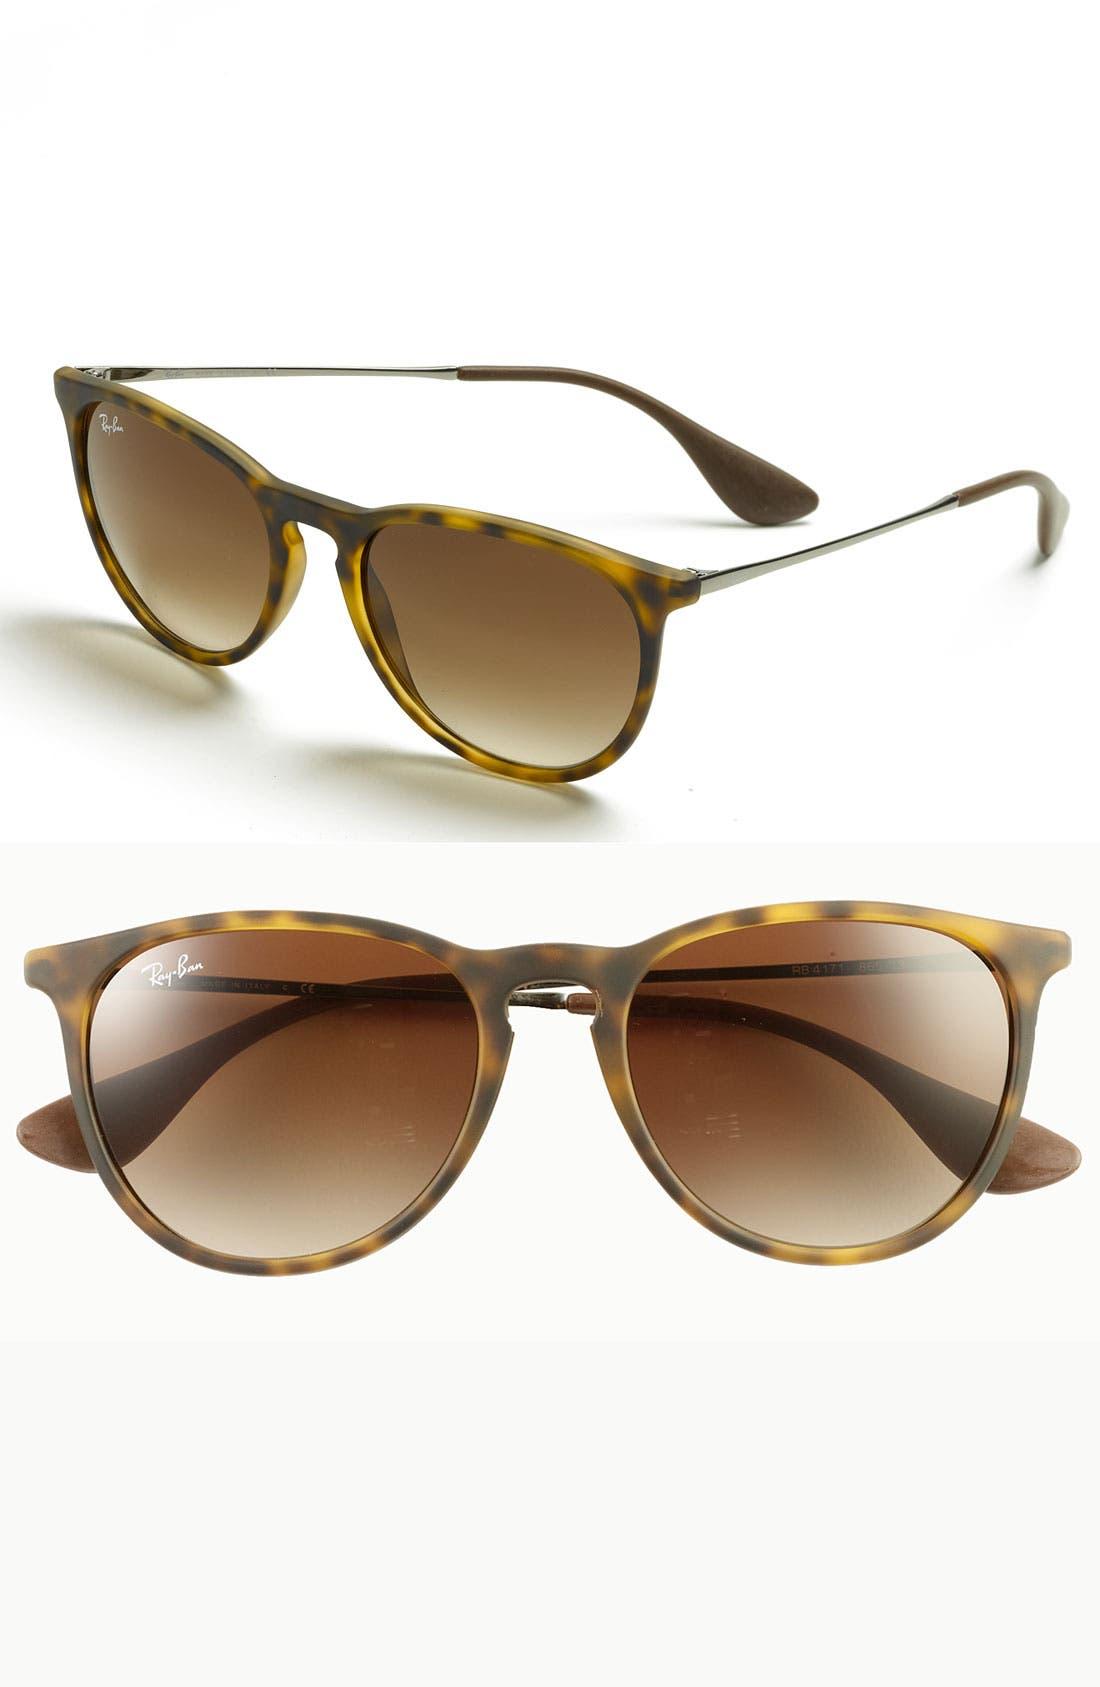 original sunglasses  Ray-Ban Erika Classic 54mm Sunglasses